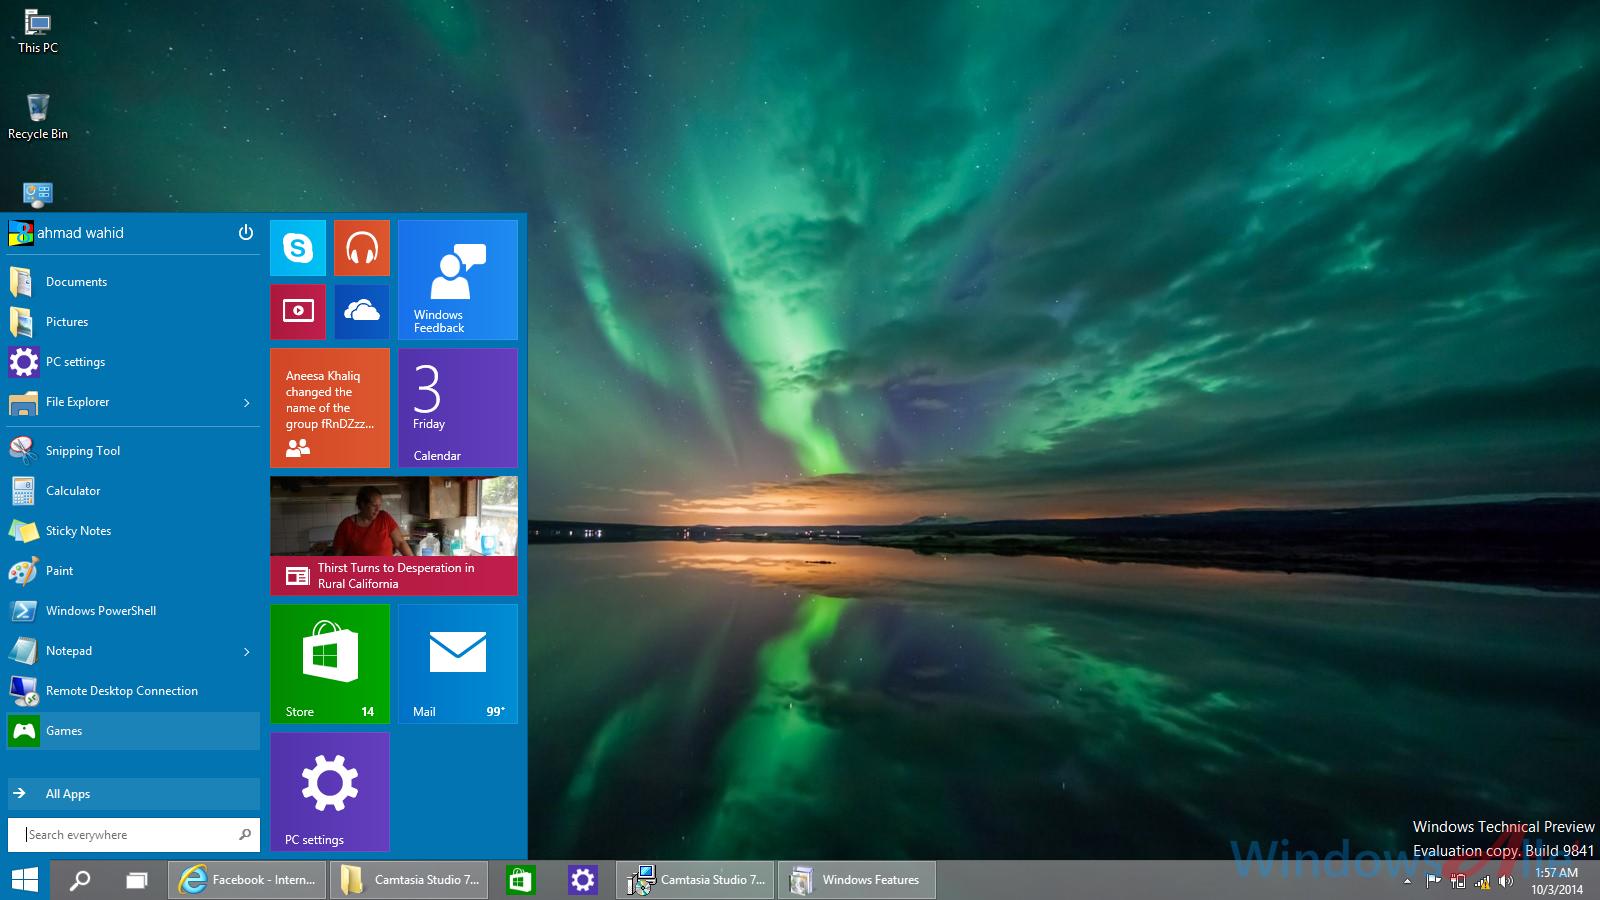 hd wallpaper app windows 10